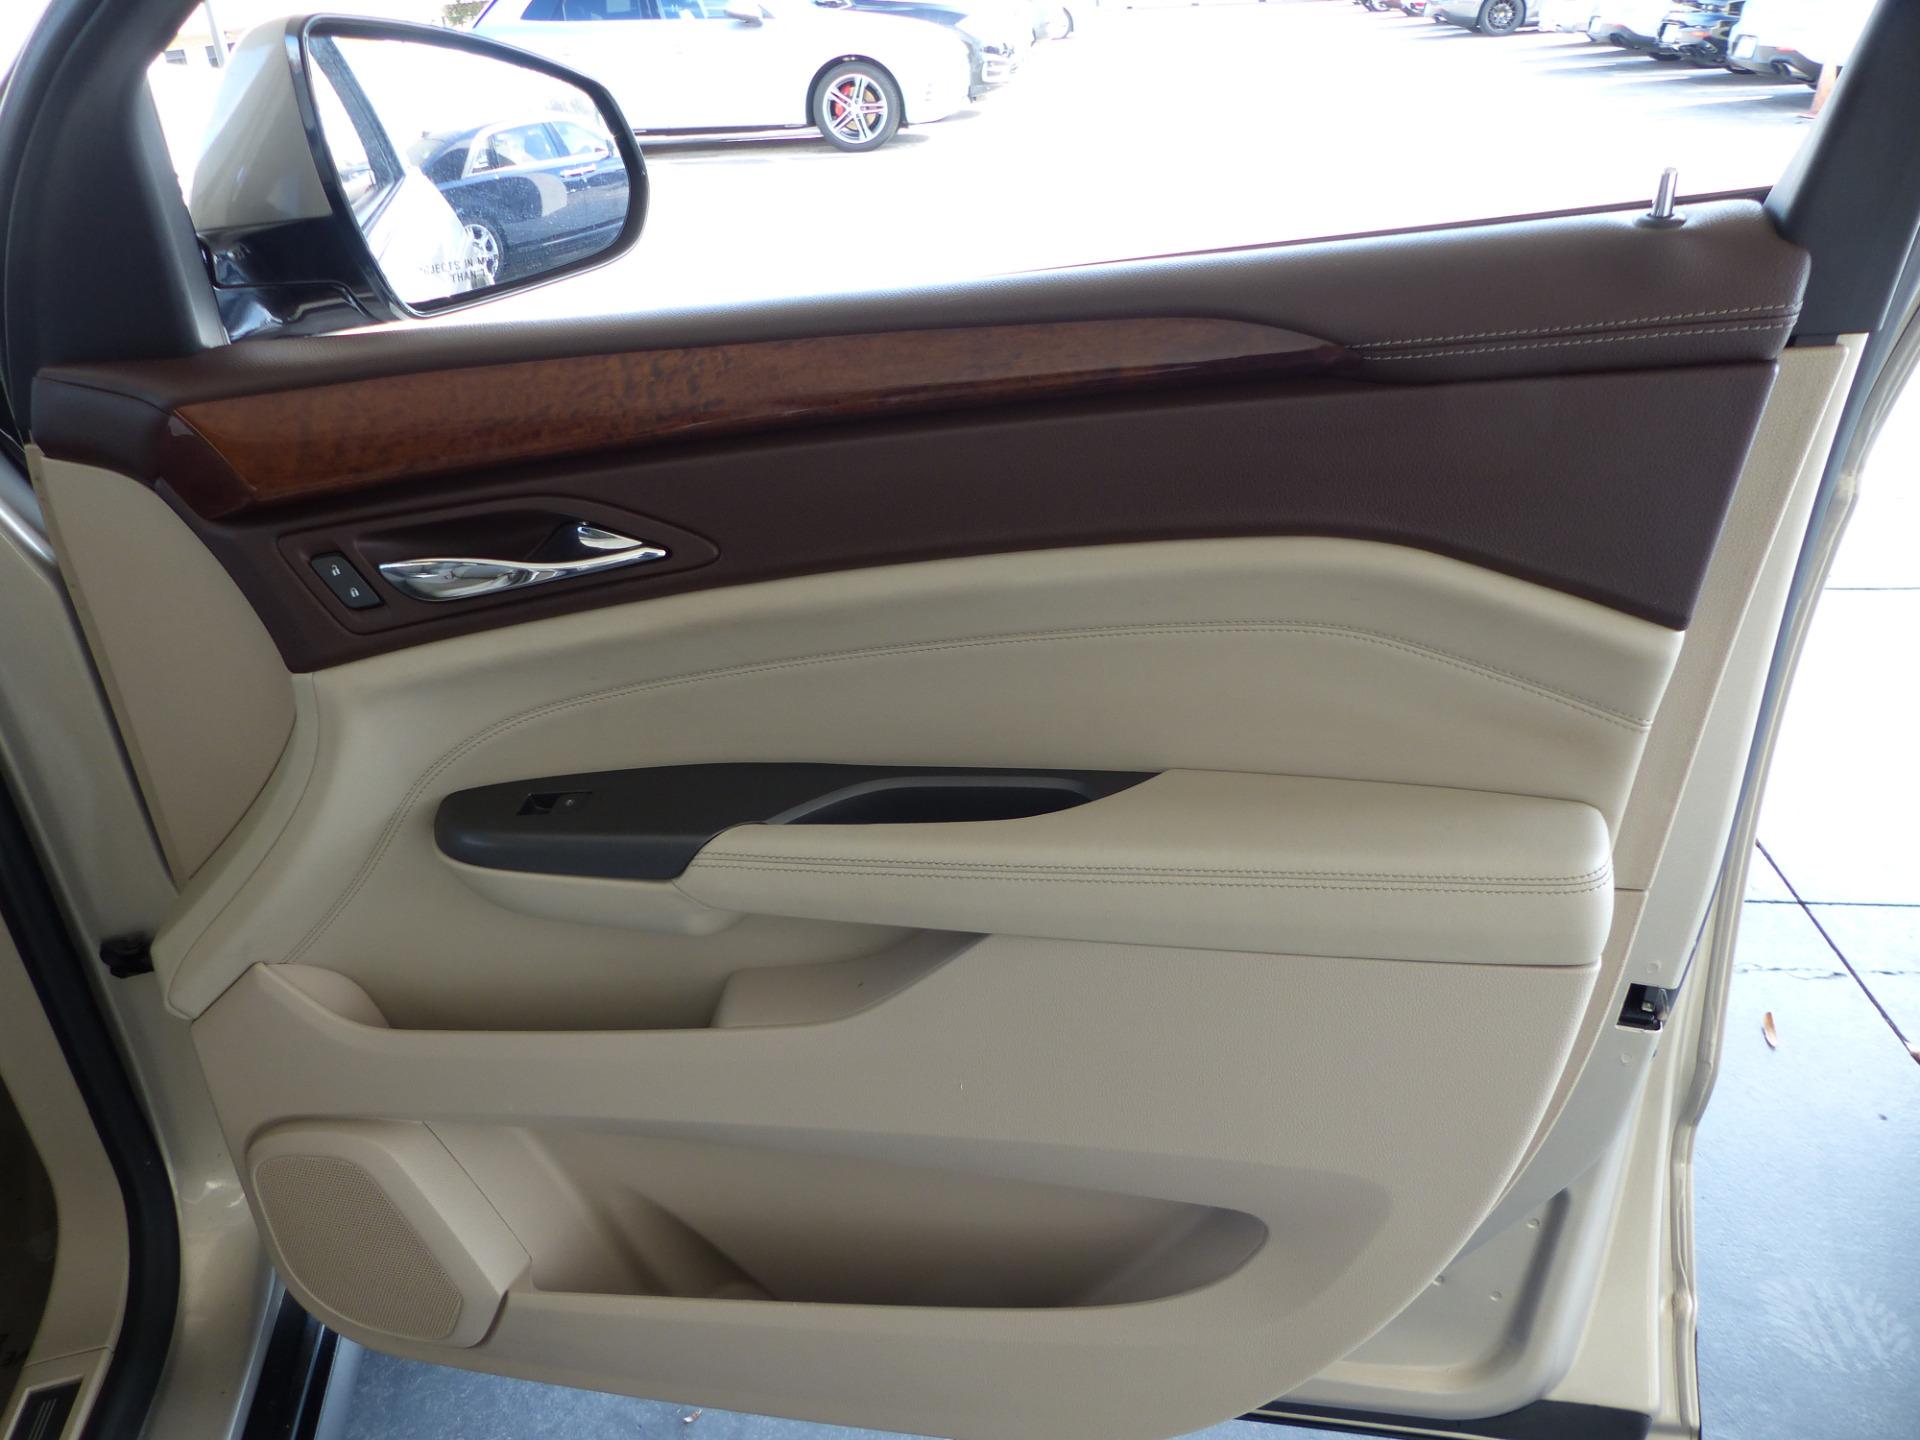 Cadillac Srx Aftermarket Wheels >> Used 2012 Cadillac SRX Luxury | Marietta, GA